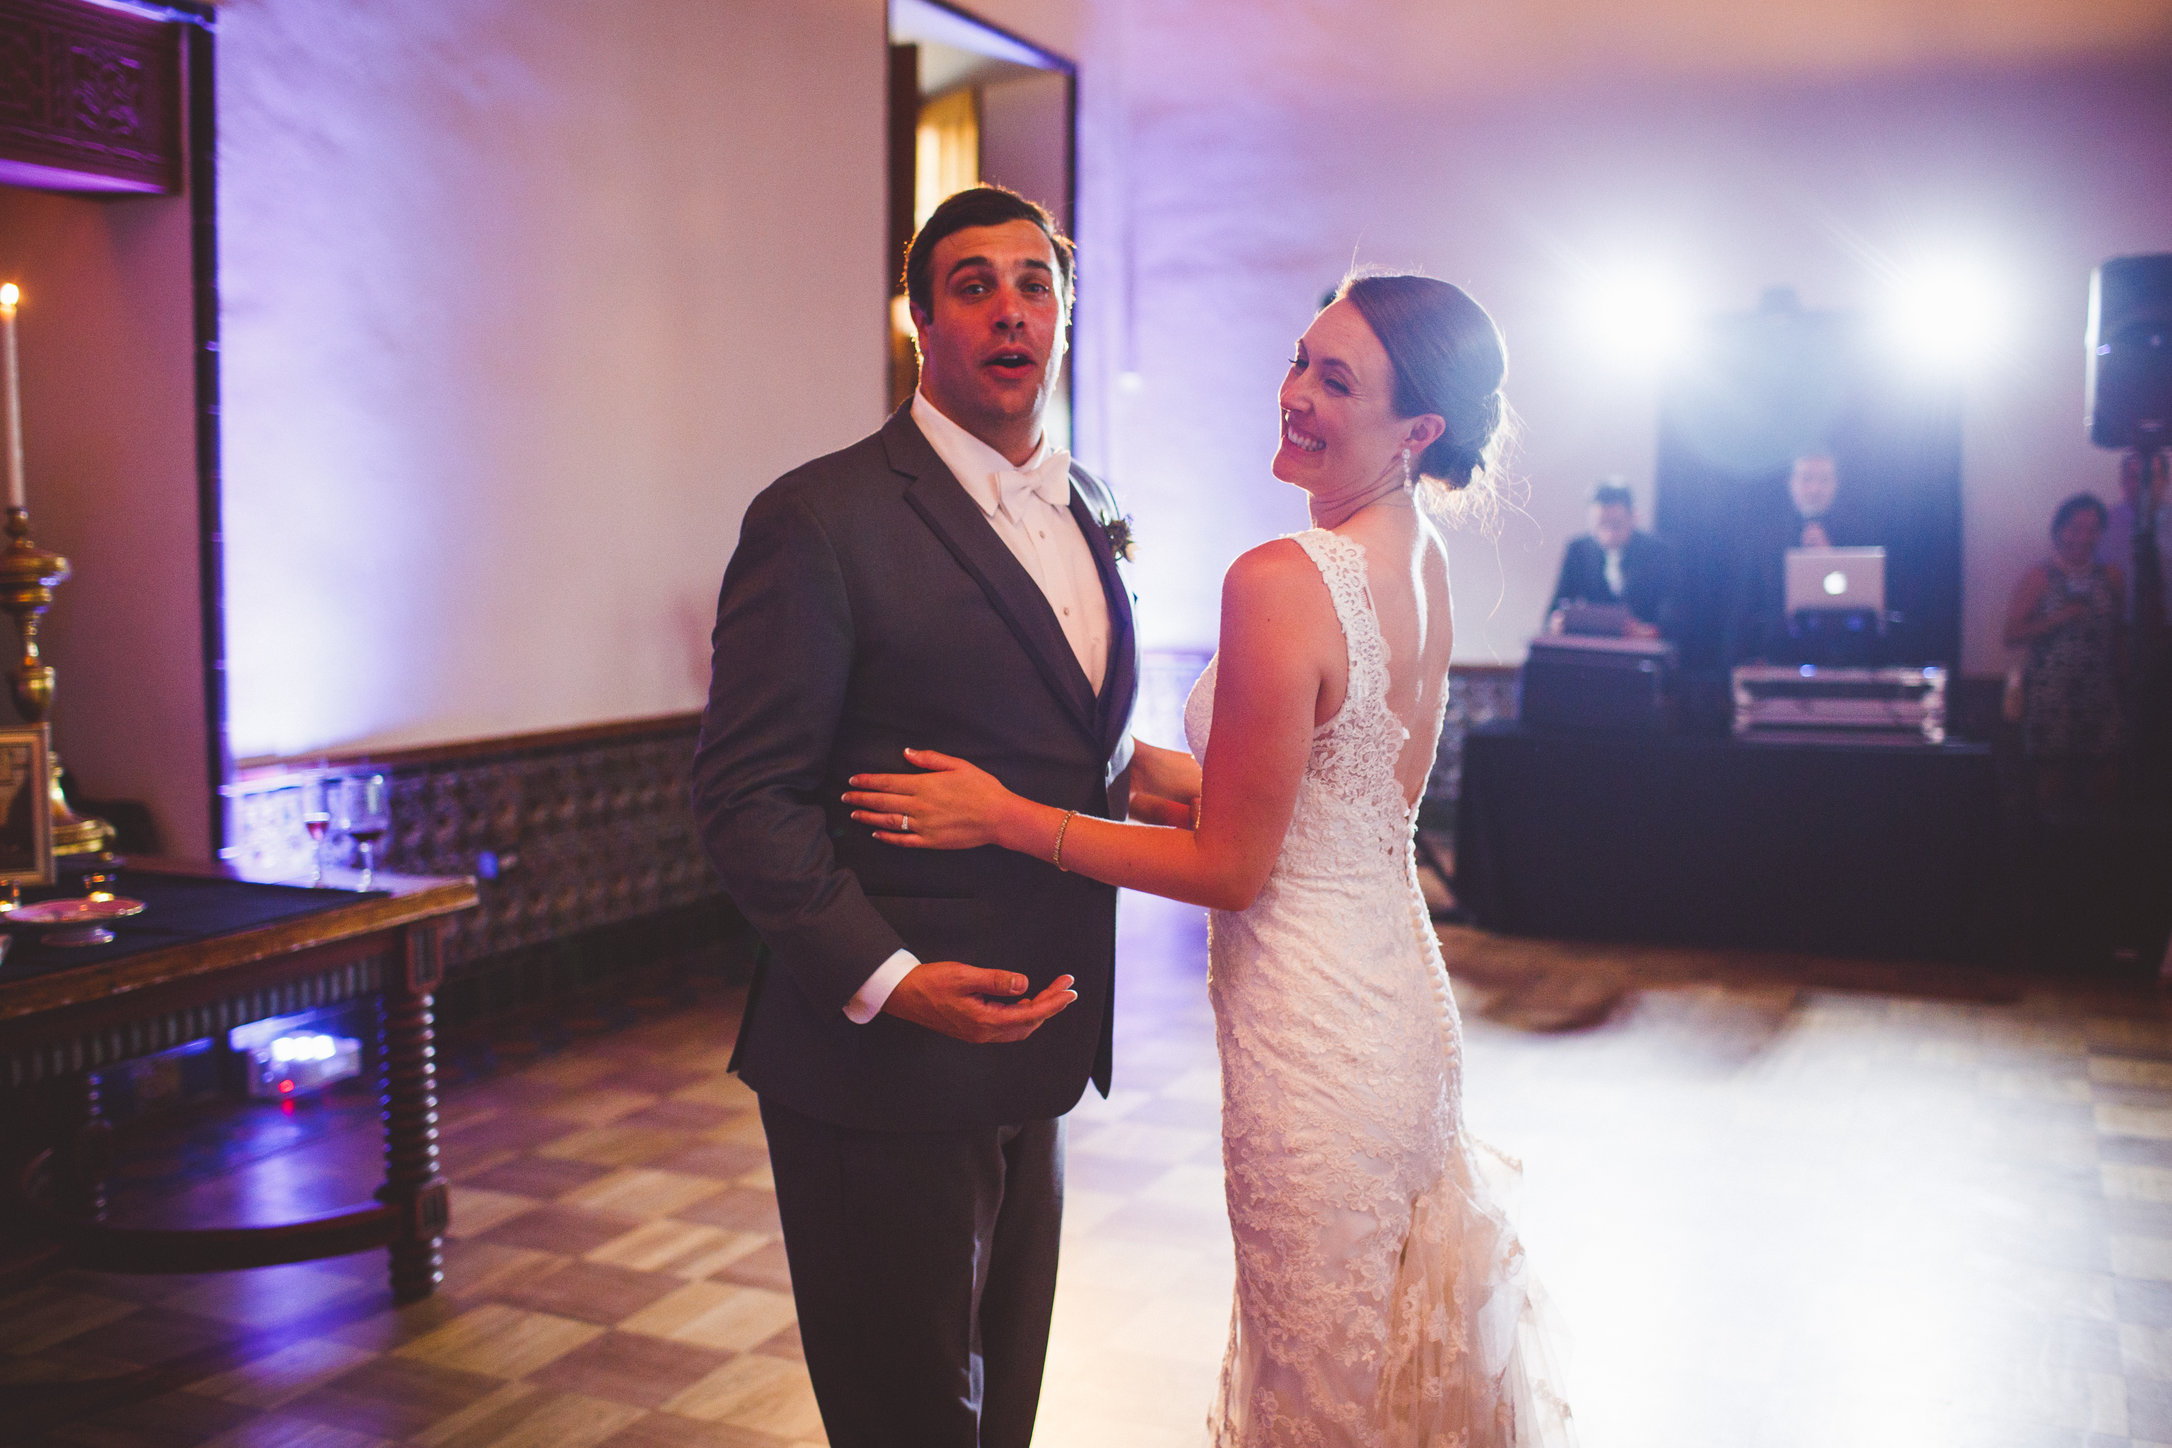 SandC-wedding-631.jpg